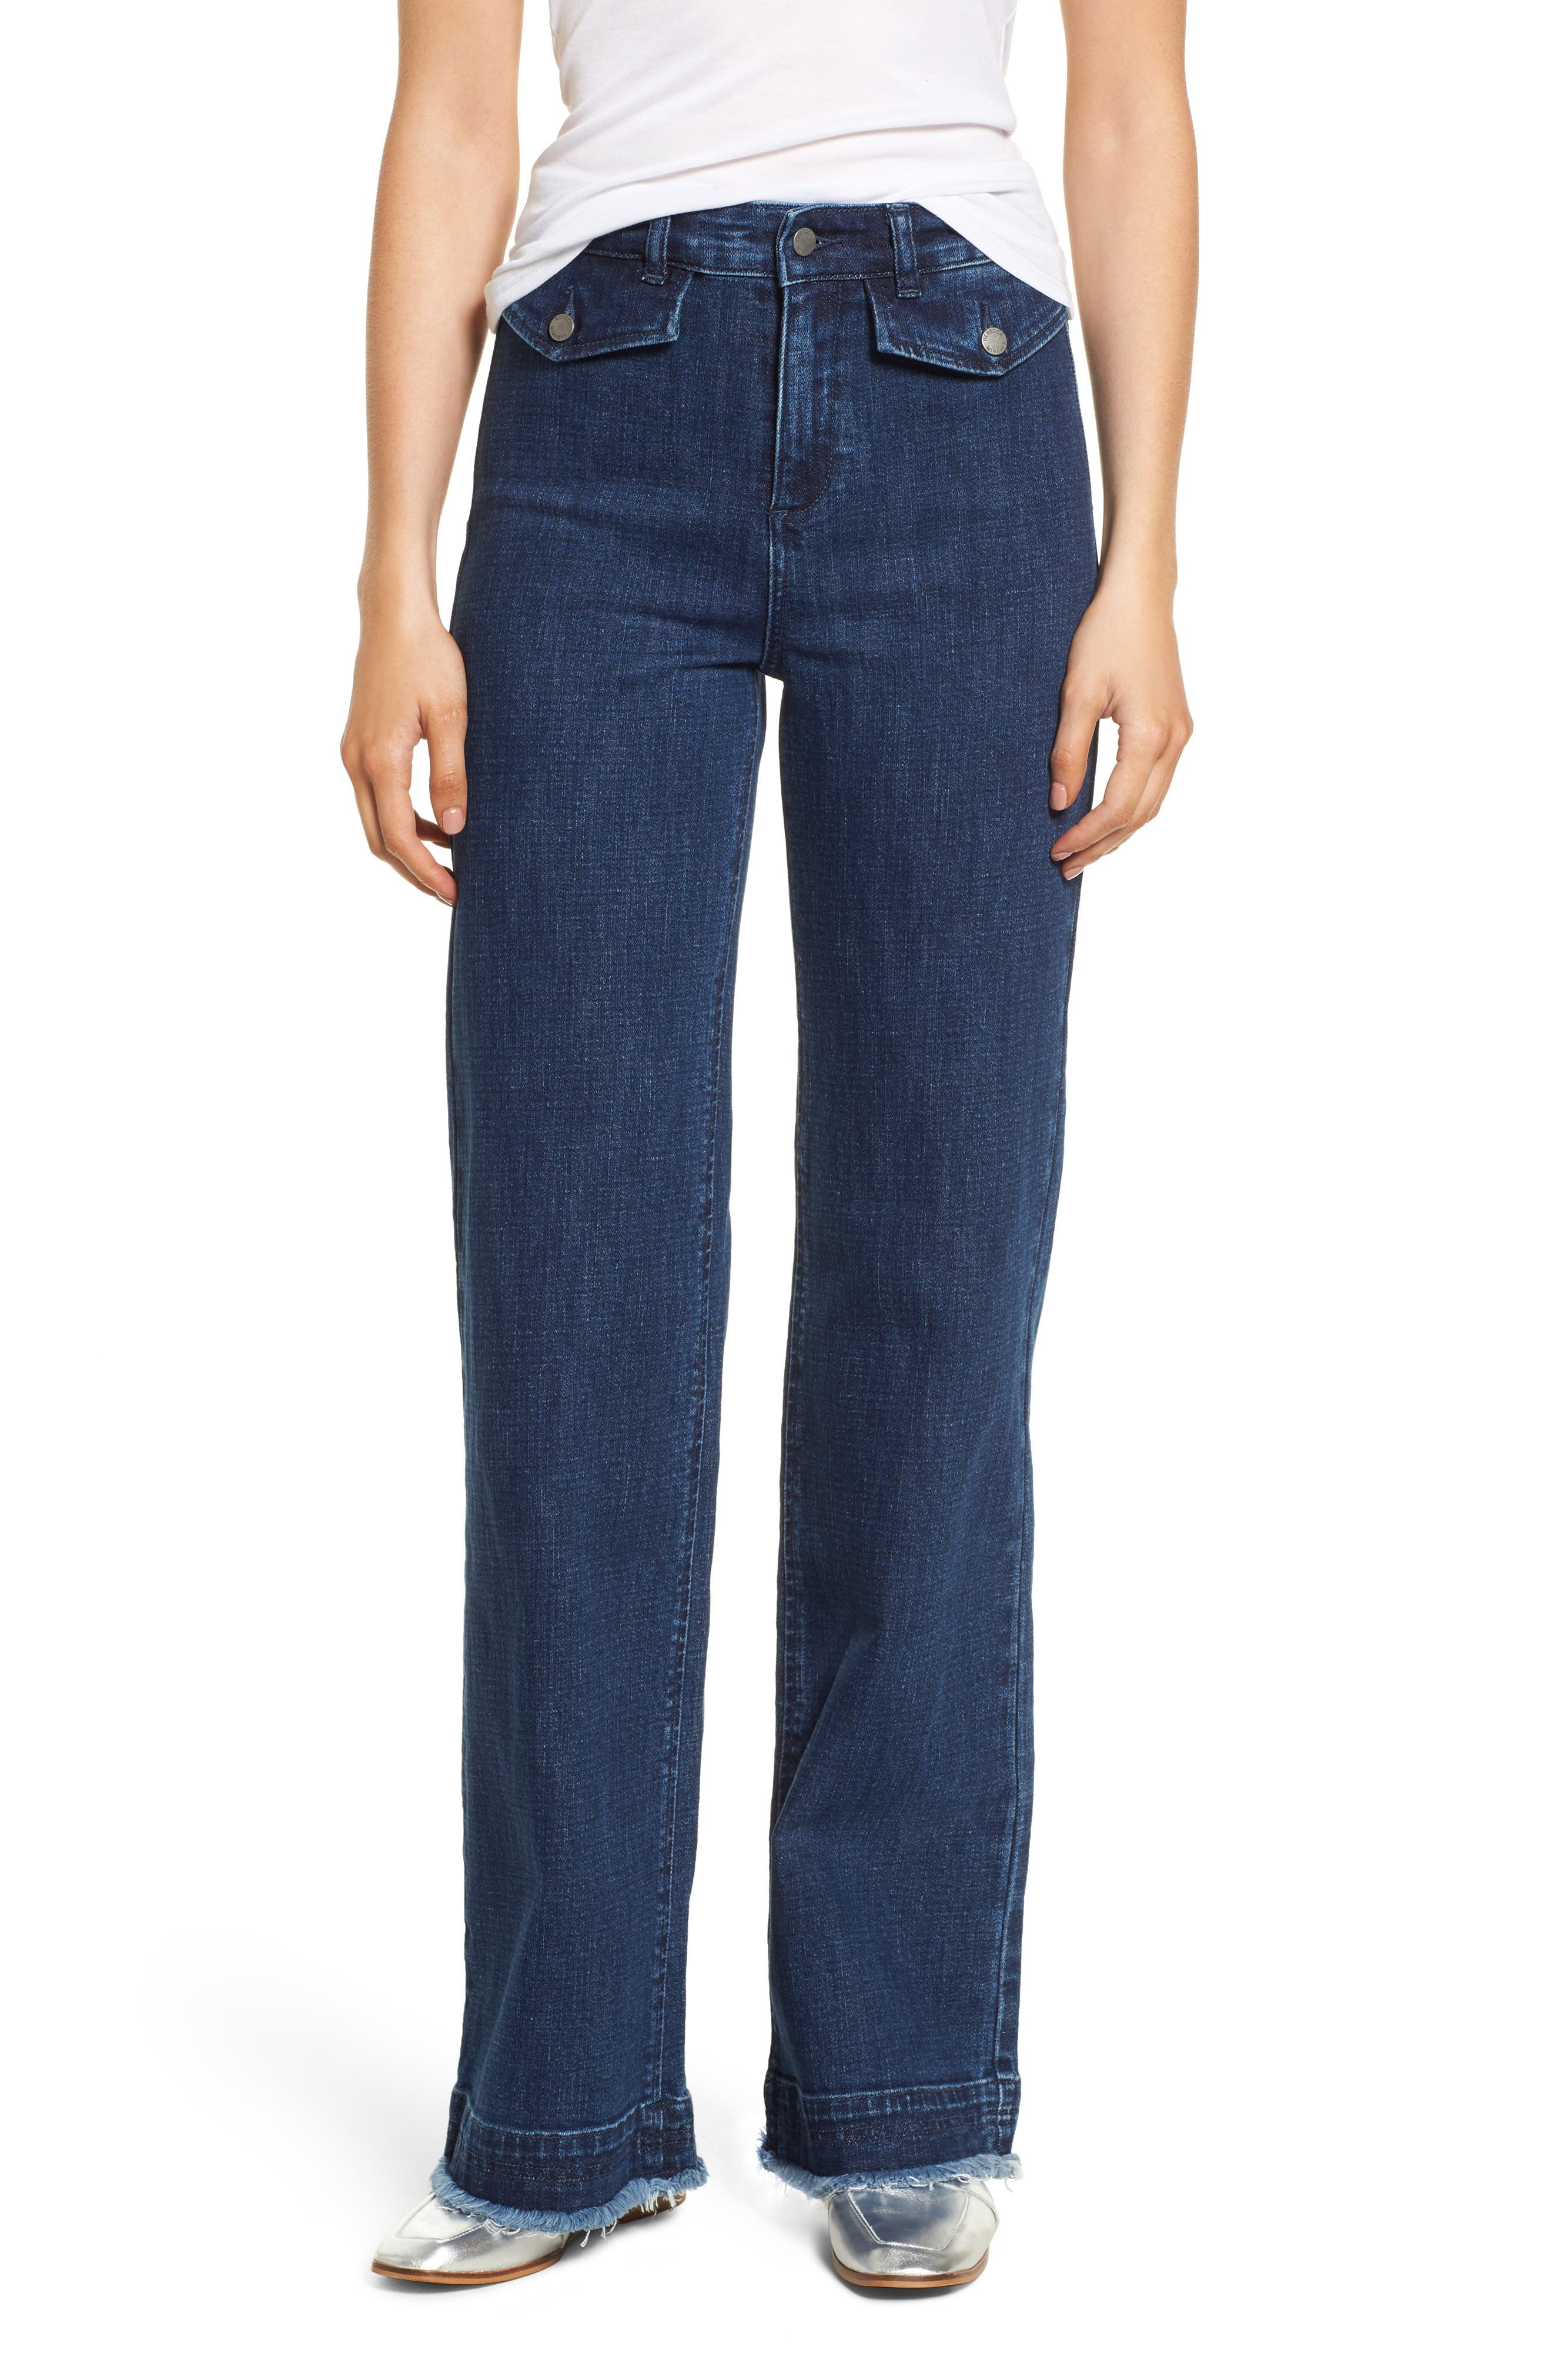 Elwood Wide Leg Jeans,                         Main,                         color, INDIGO